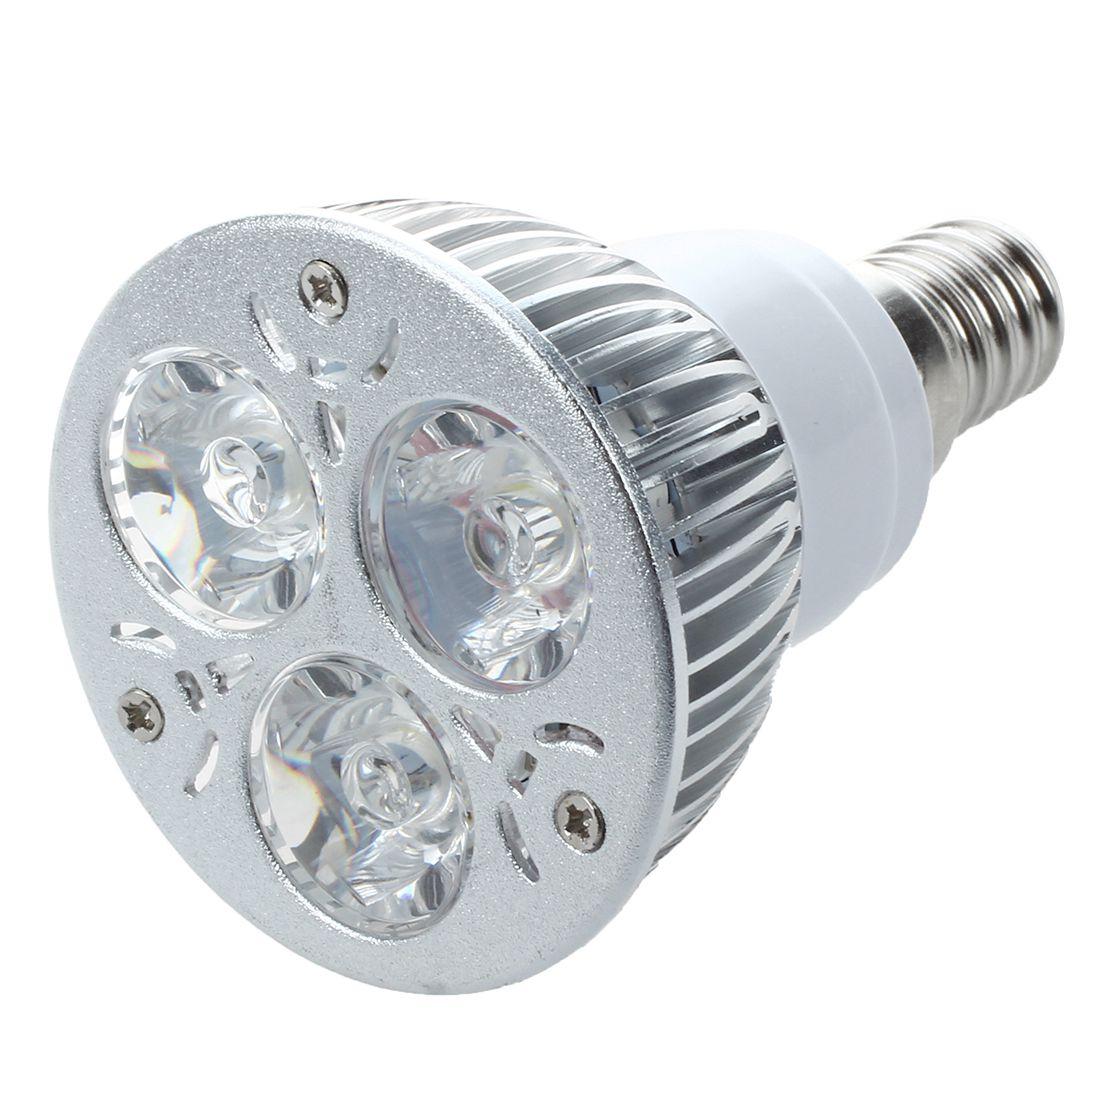 LED S2R2 E14 6500K Bulb about 3W Details Light Power 3 Lamp White High KlFc1J